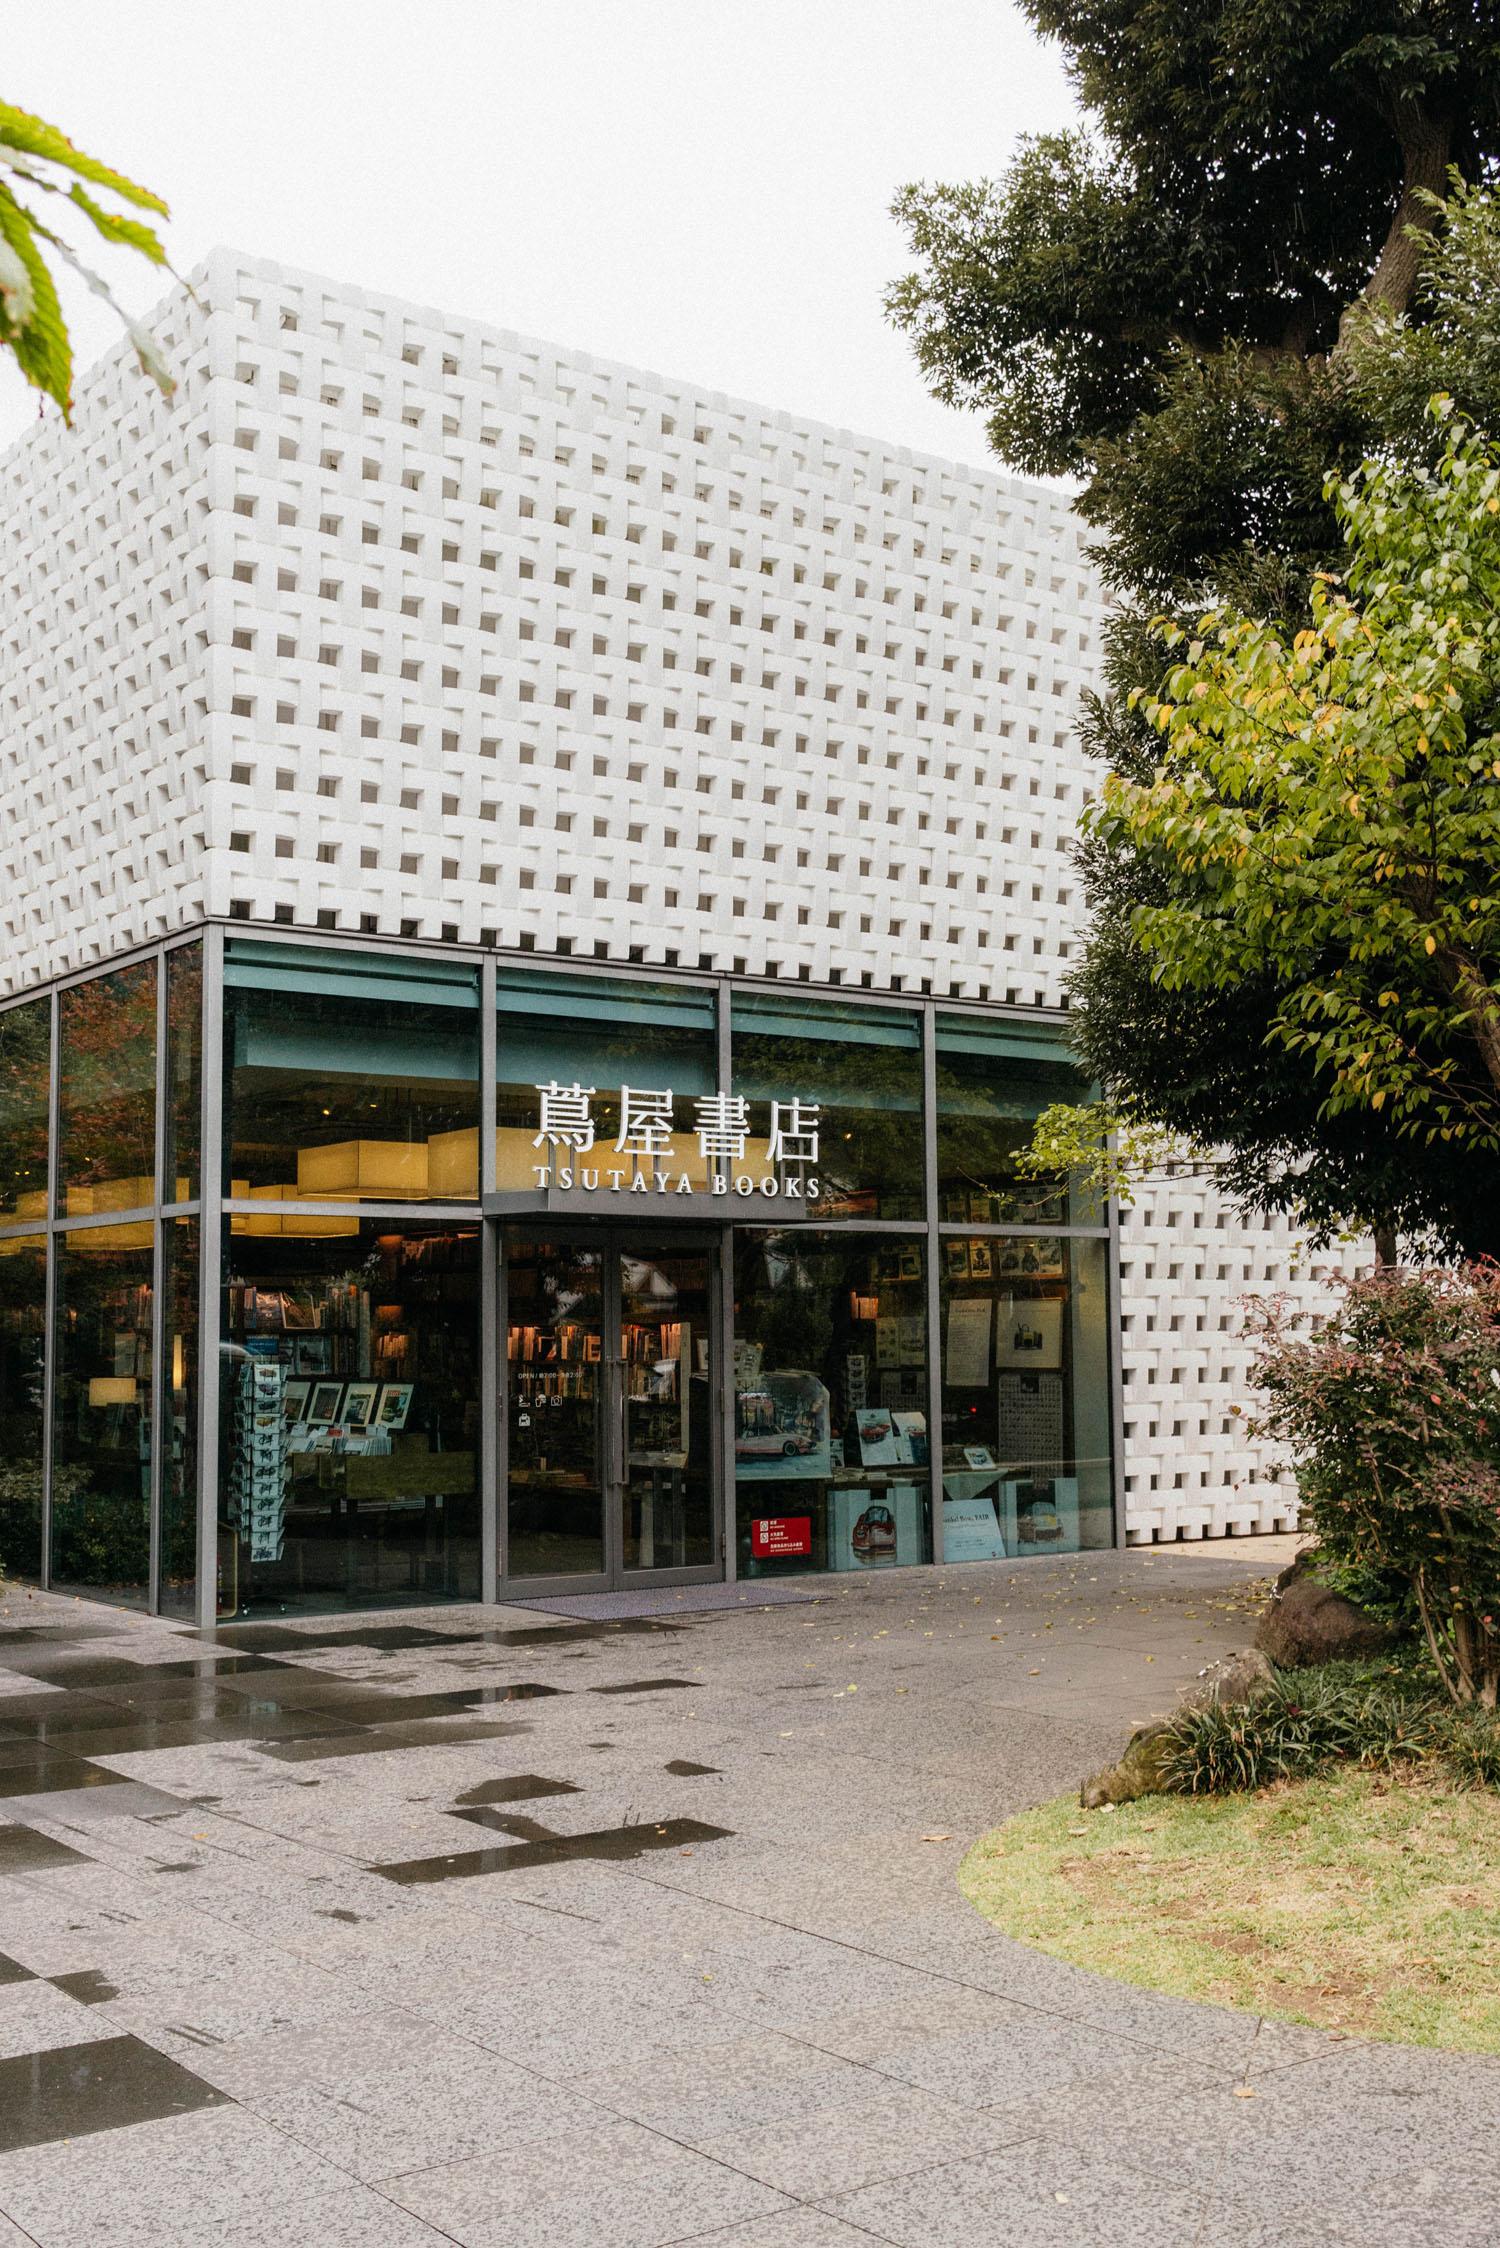 Tsutaya Books Daikanyama  – flagship bookstore consisting of 3 buildings